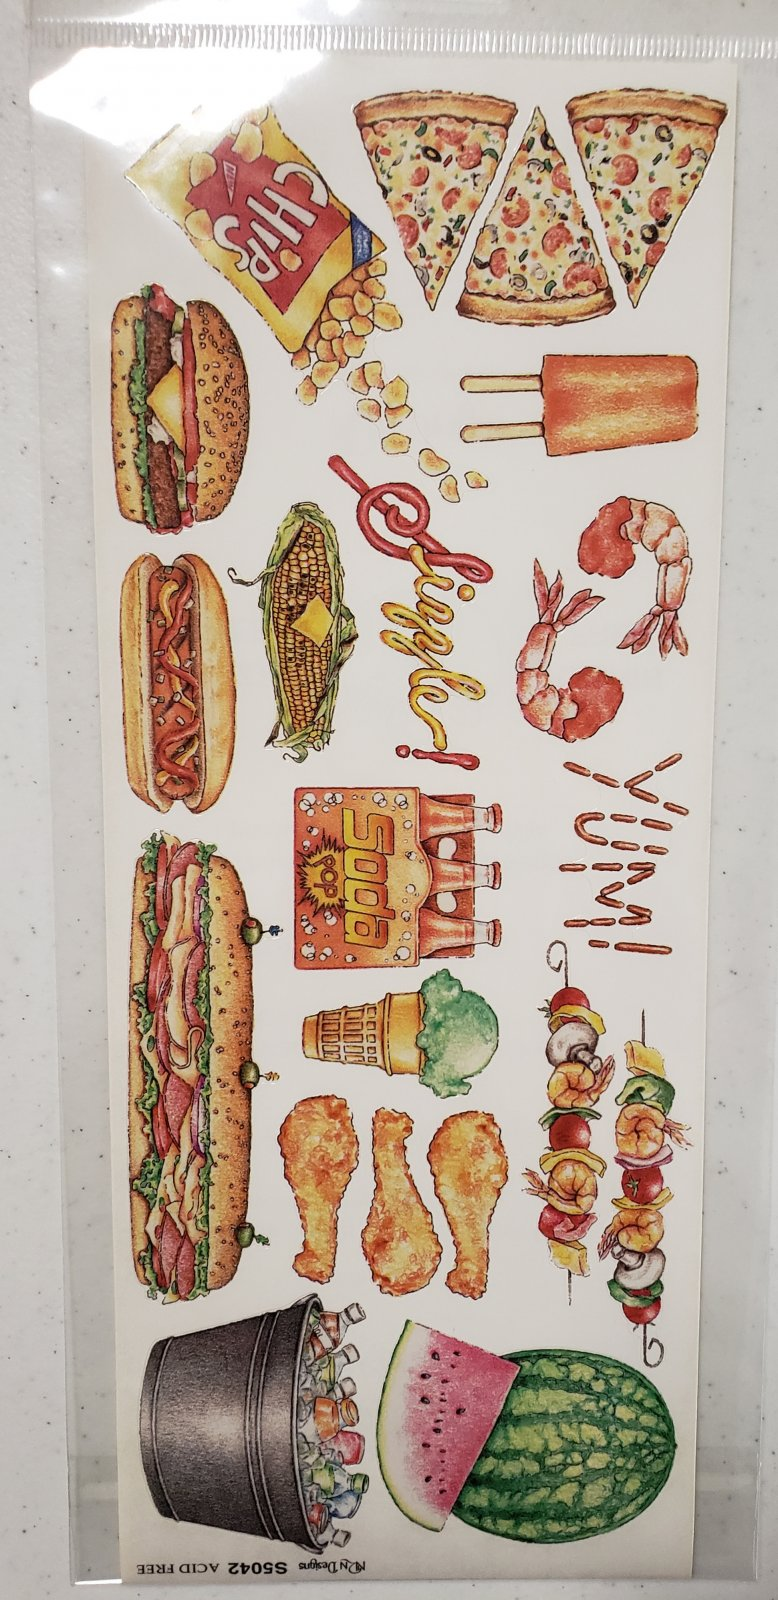 Nrn Designs Junk Food